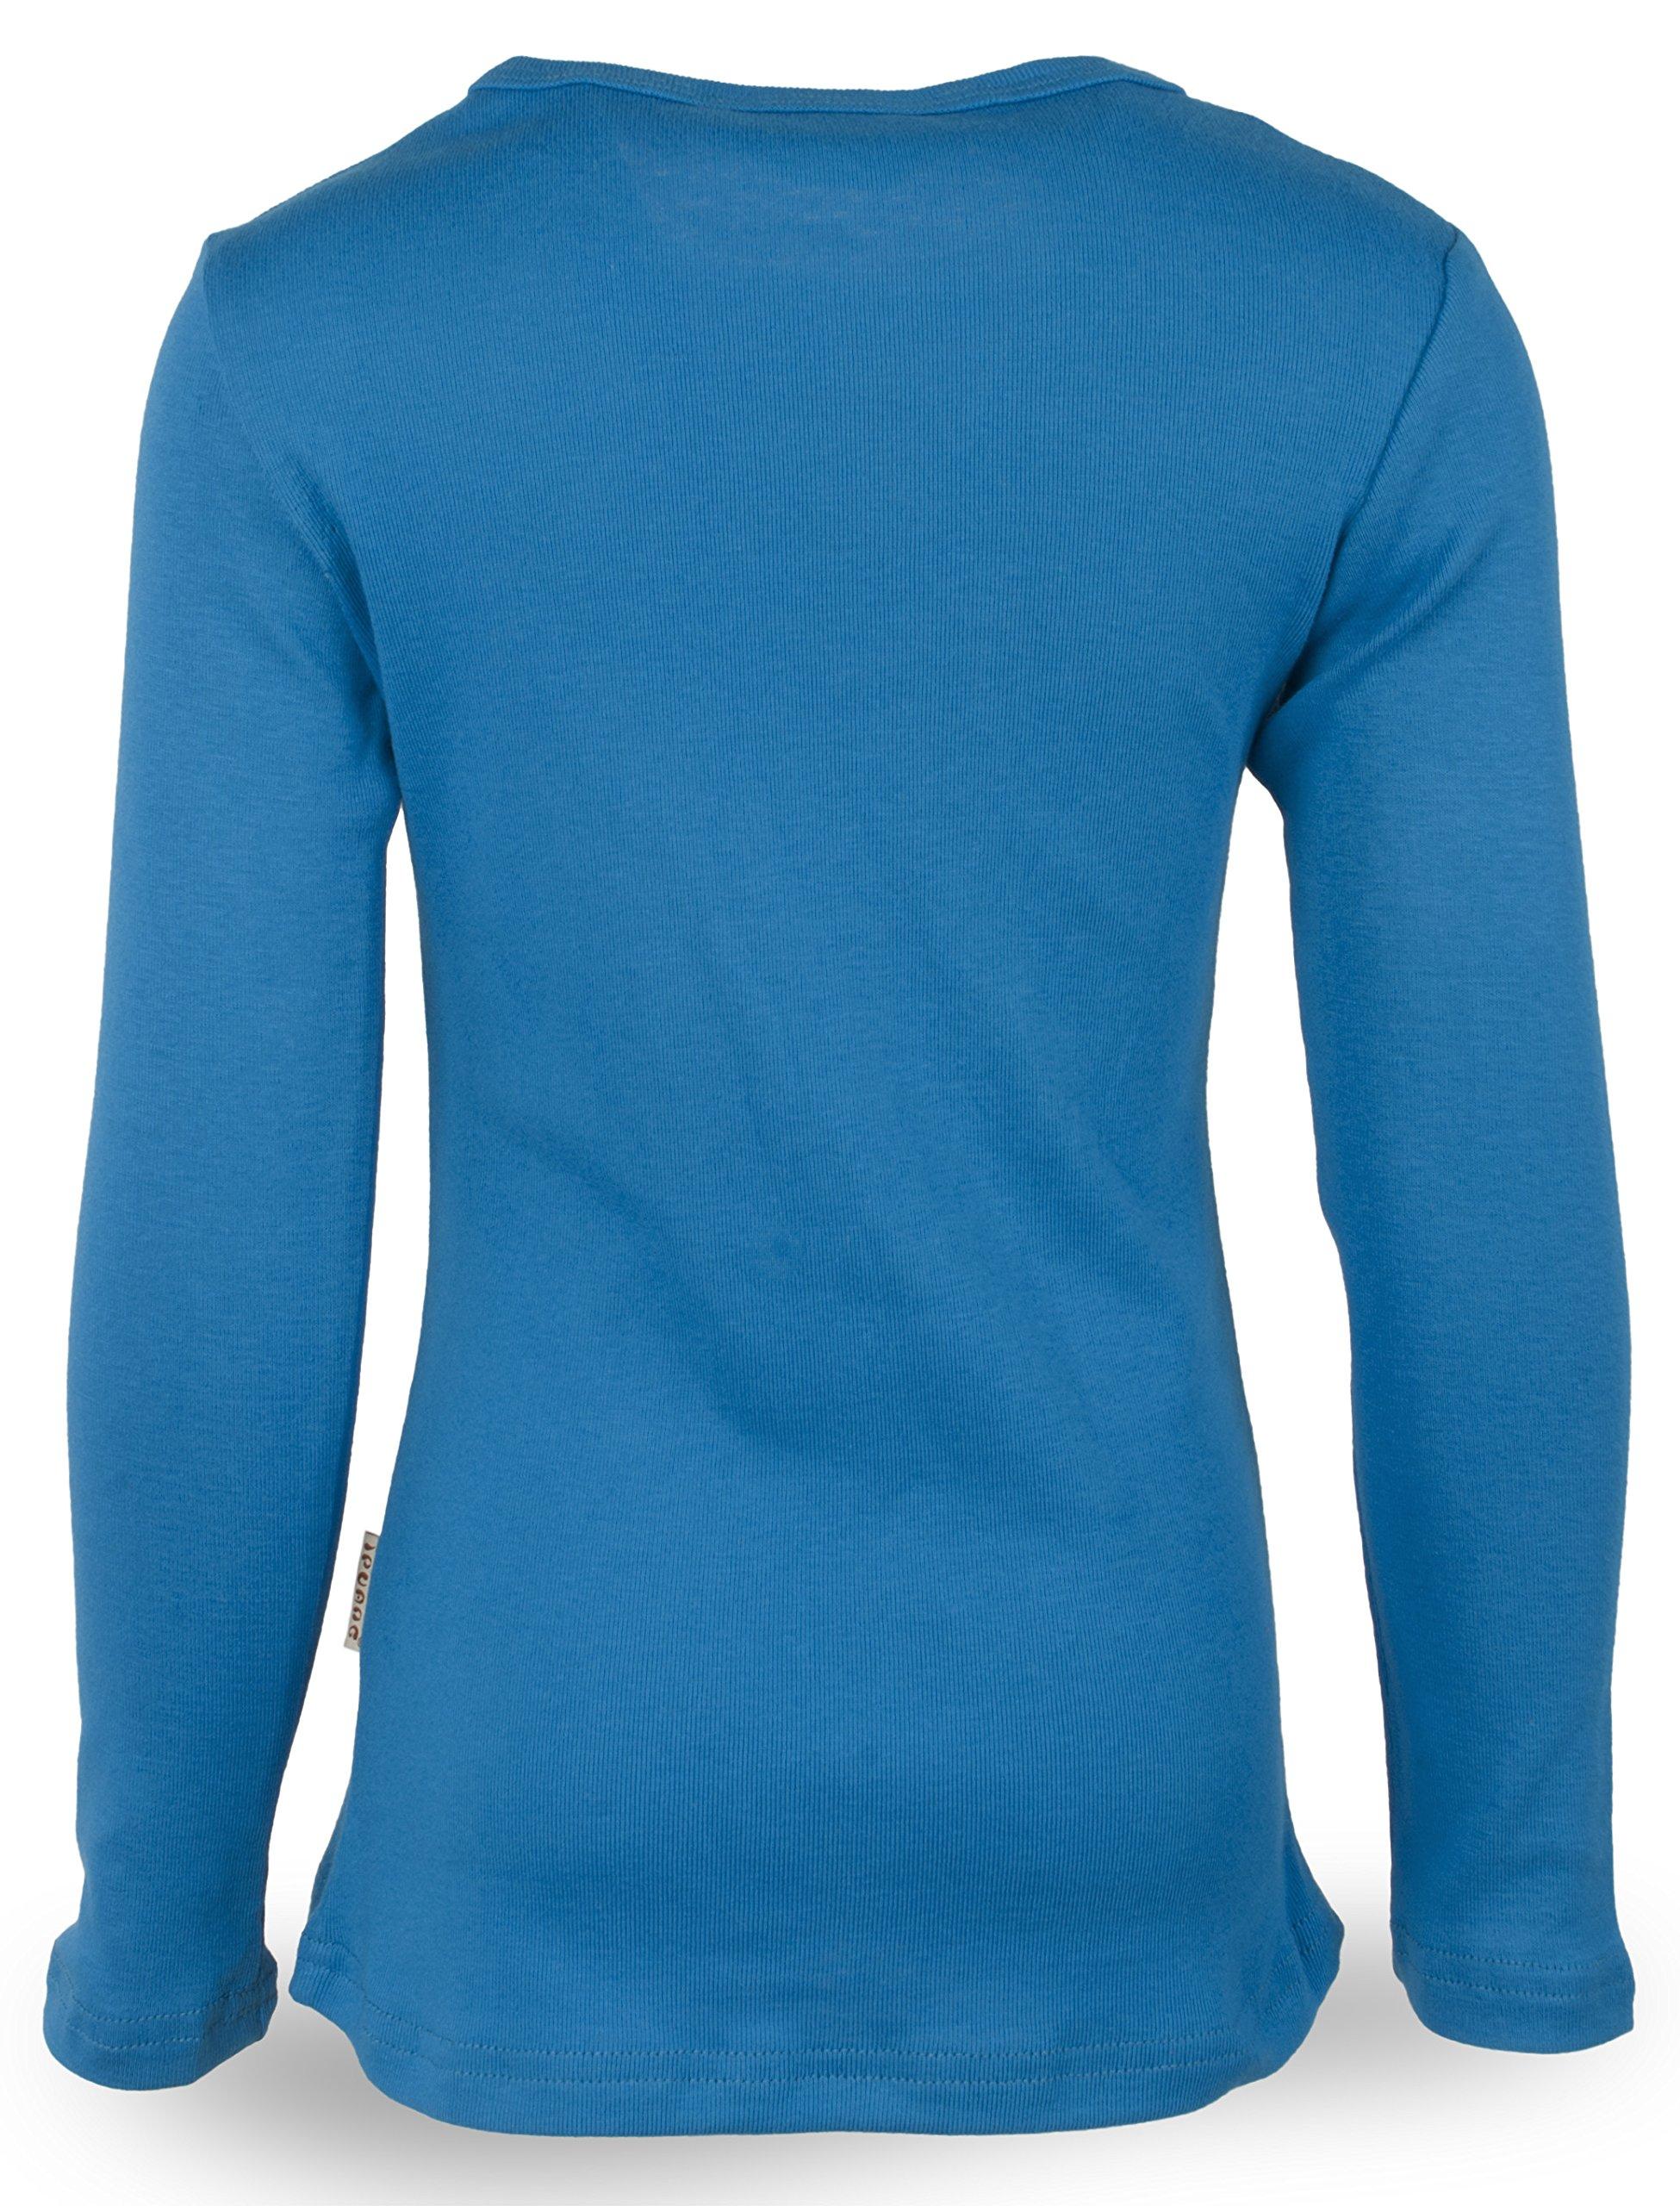 Ipuang Big Girls' Heart-Shaped Long Sleeve T-Shirt 8 Vivid Blue by Ipuang (Image #1)